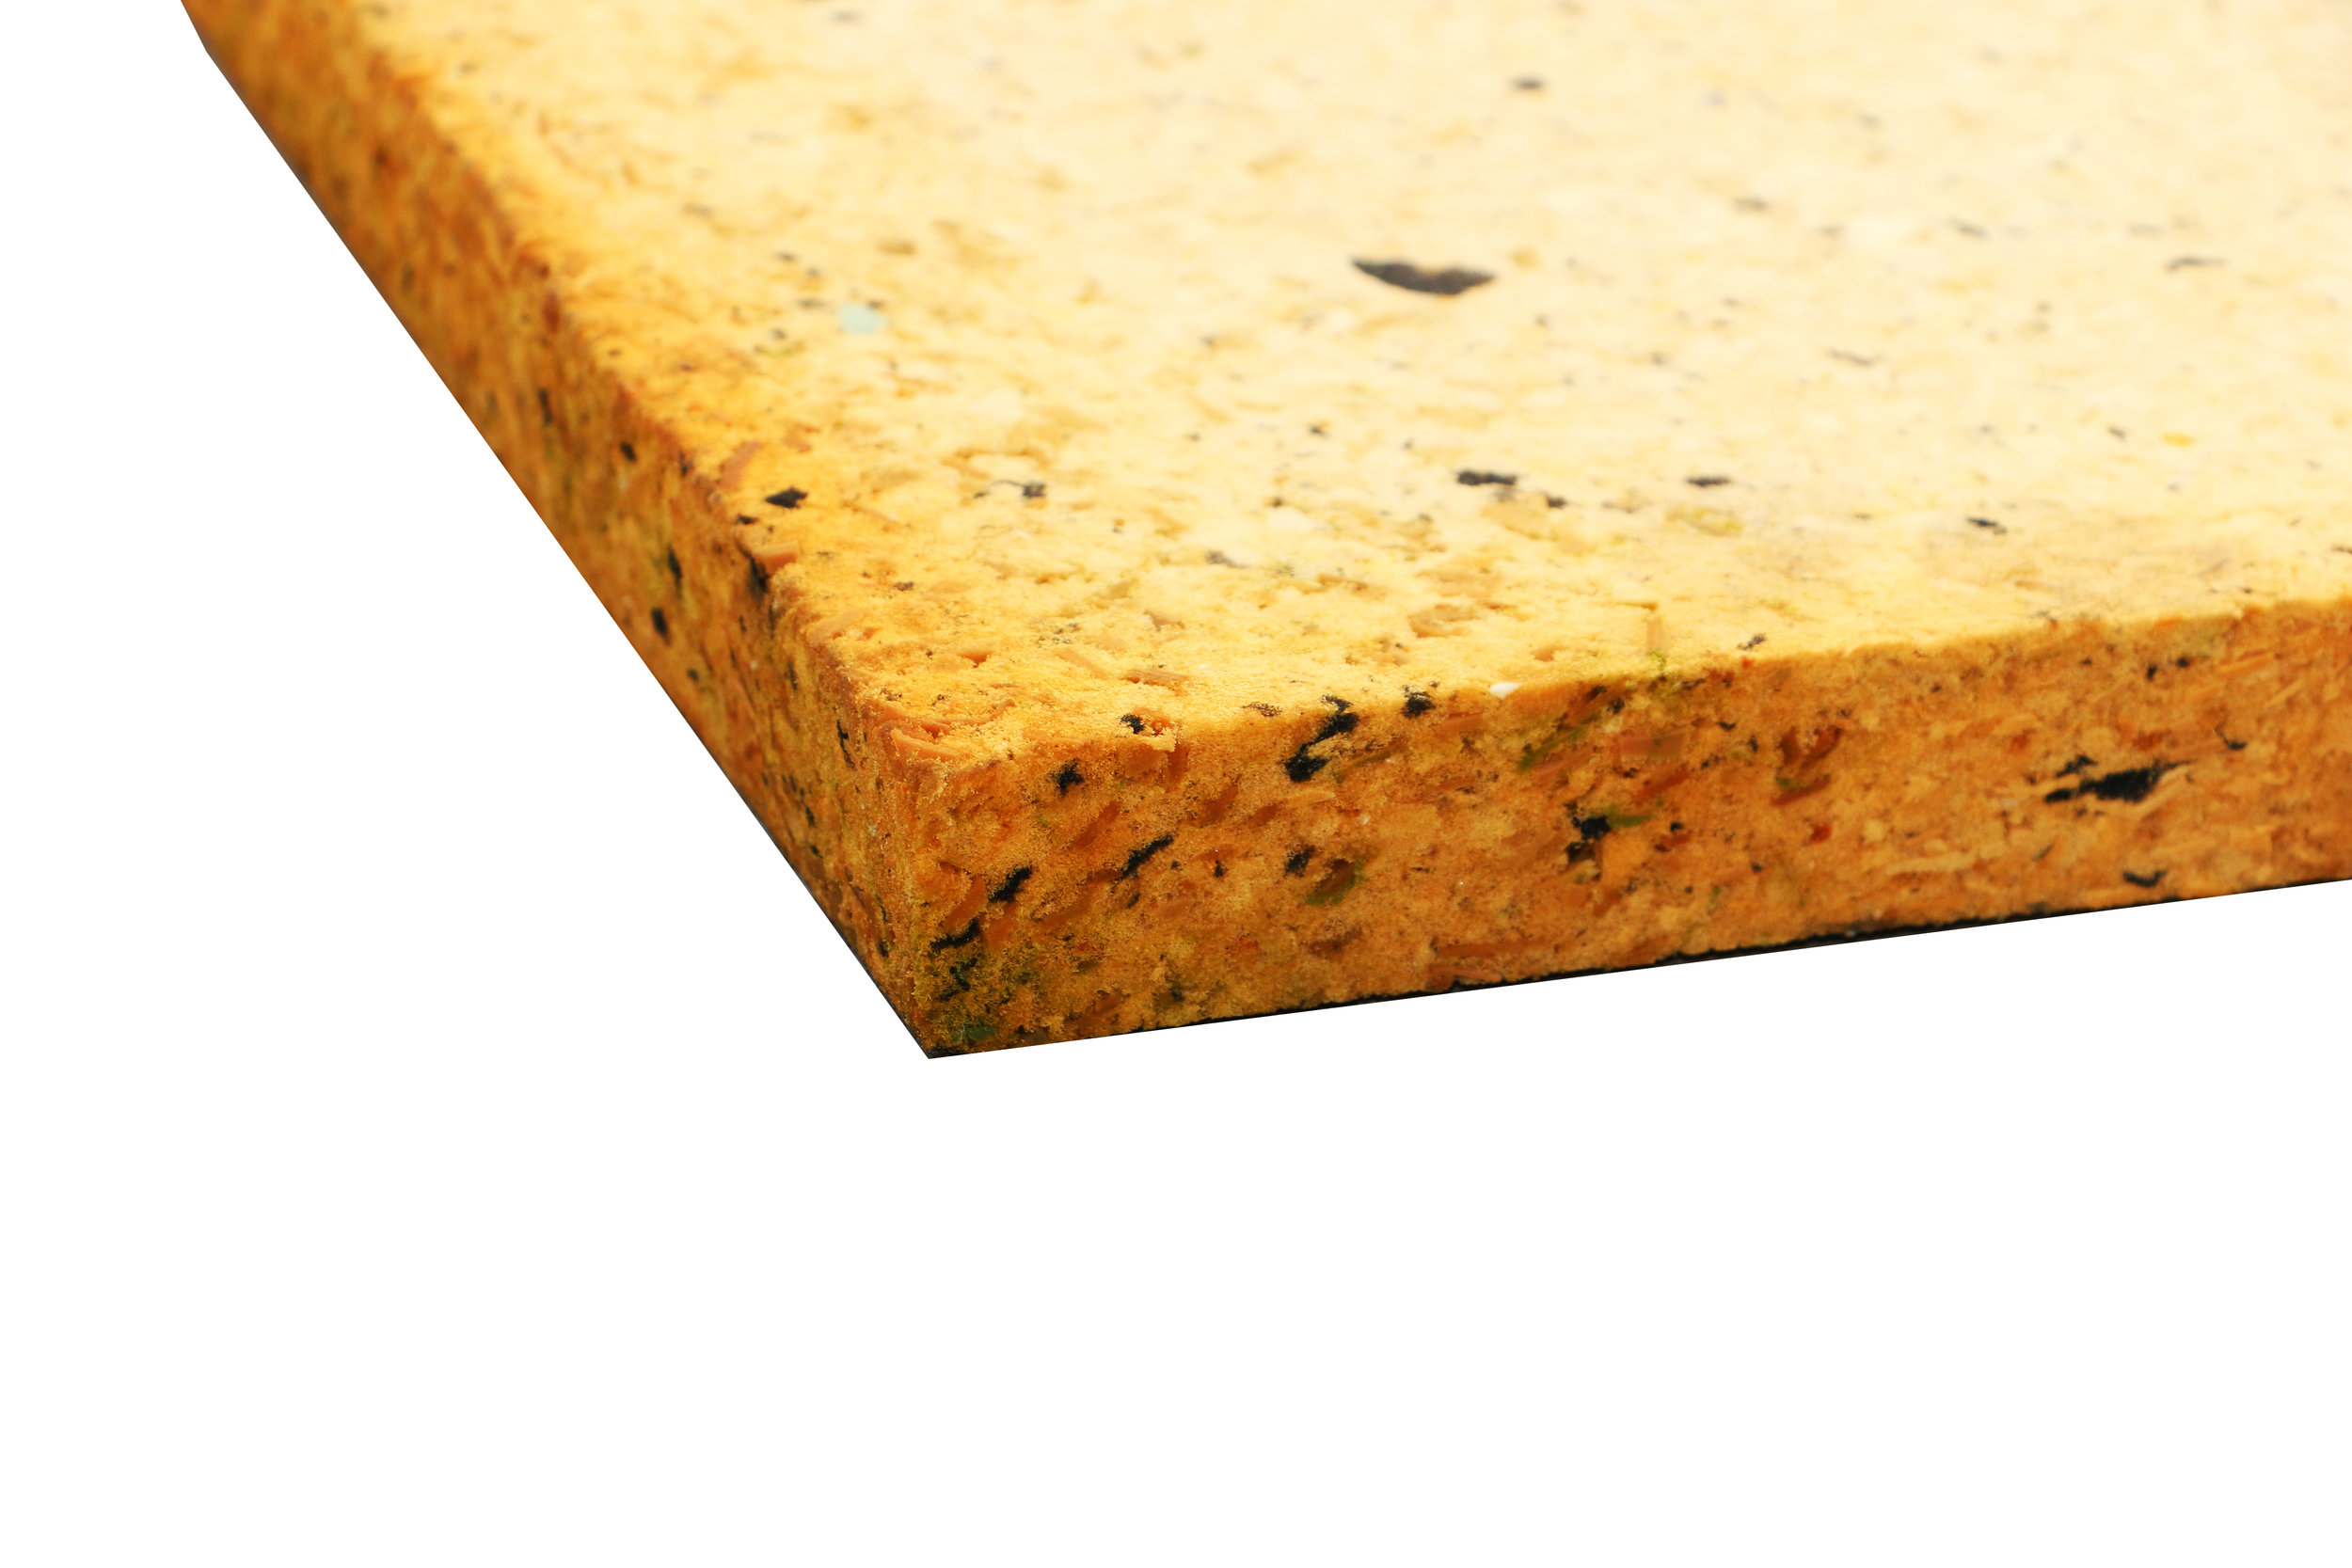 Cattle Sponge Rubber Mats